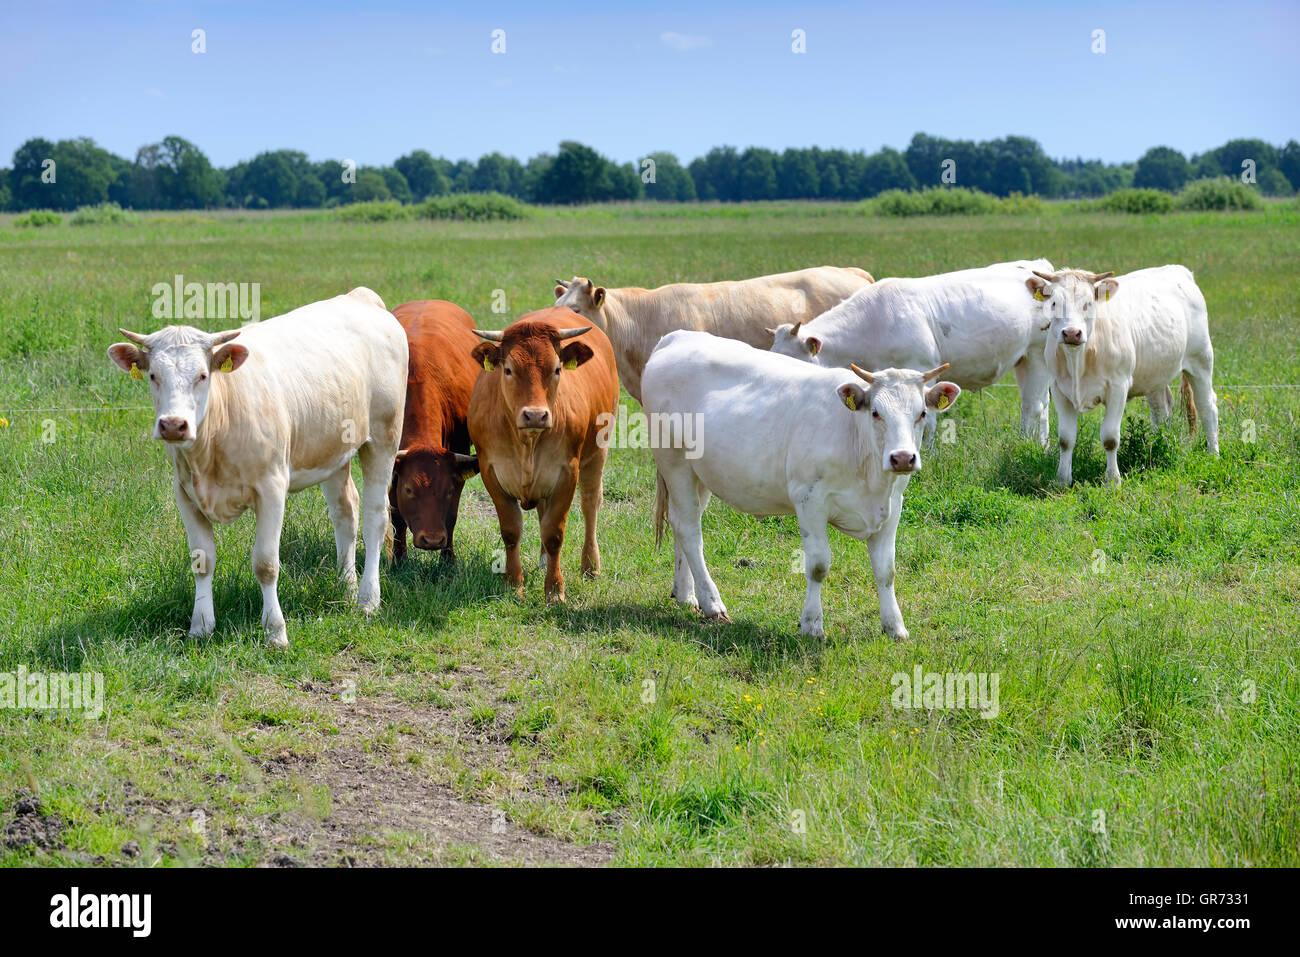 Cattle In Hamburg, Germany - Stock Image